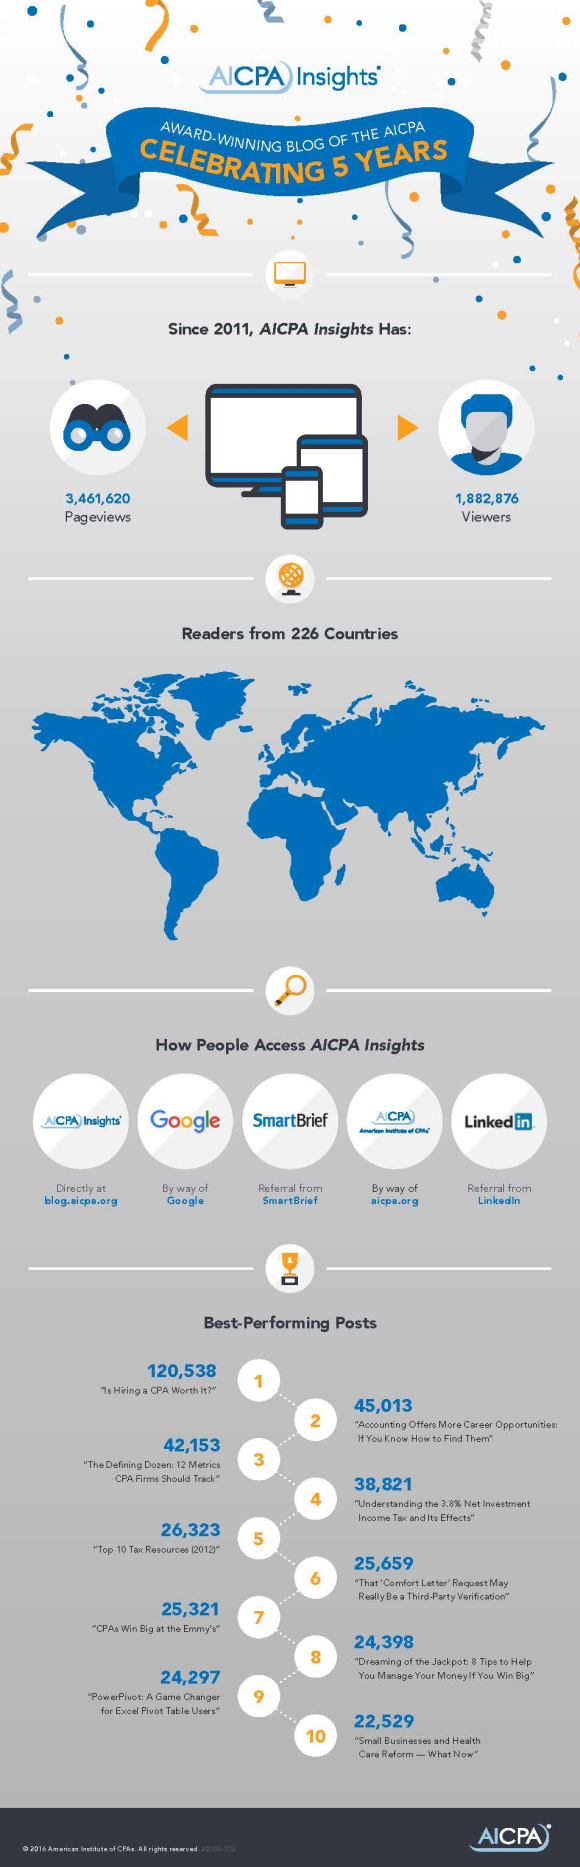 20386-312 AICPA Insights 5th Anniversary_update_R4-2